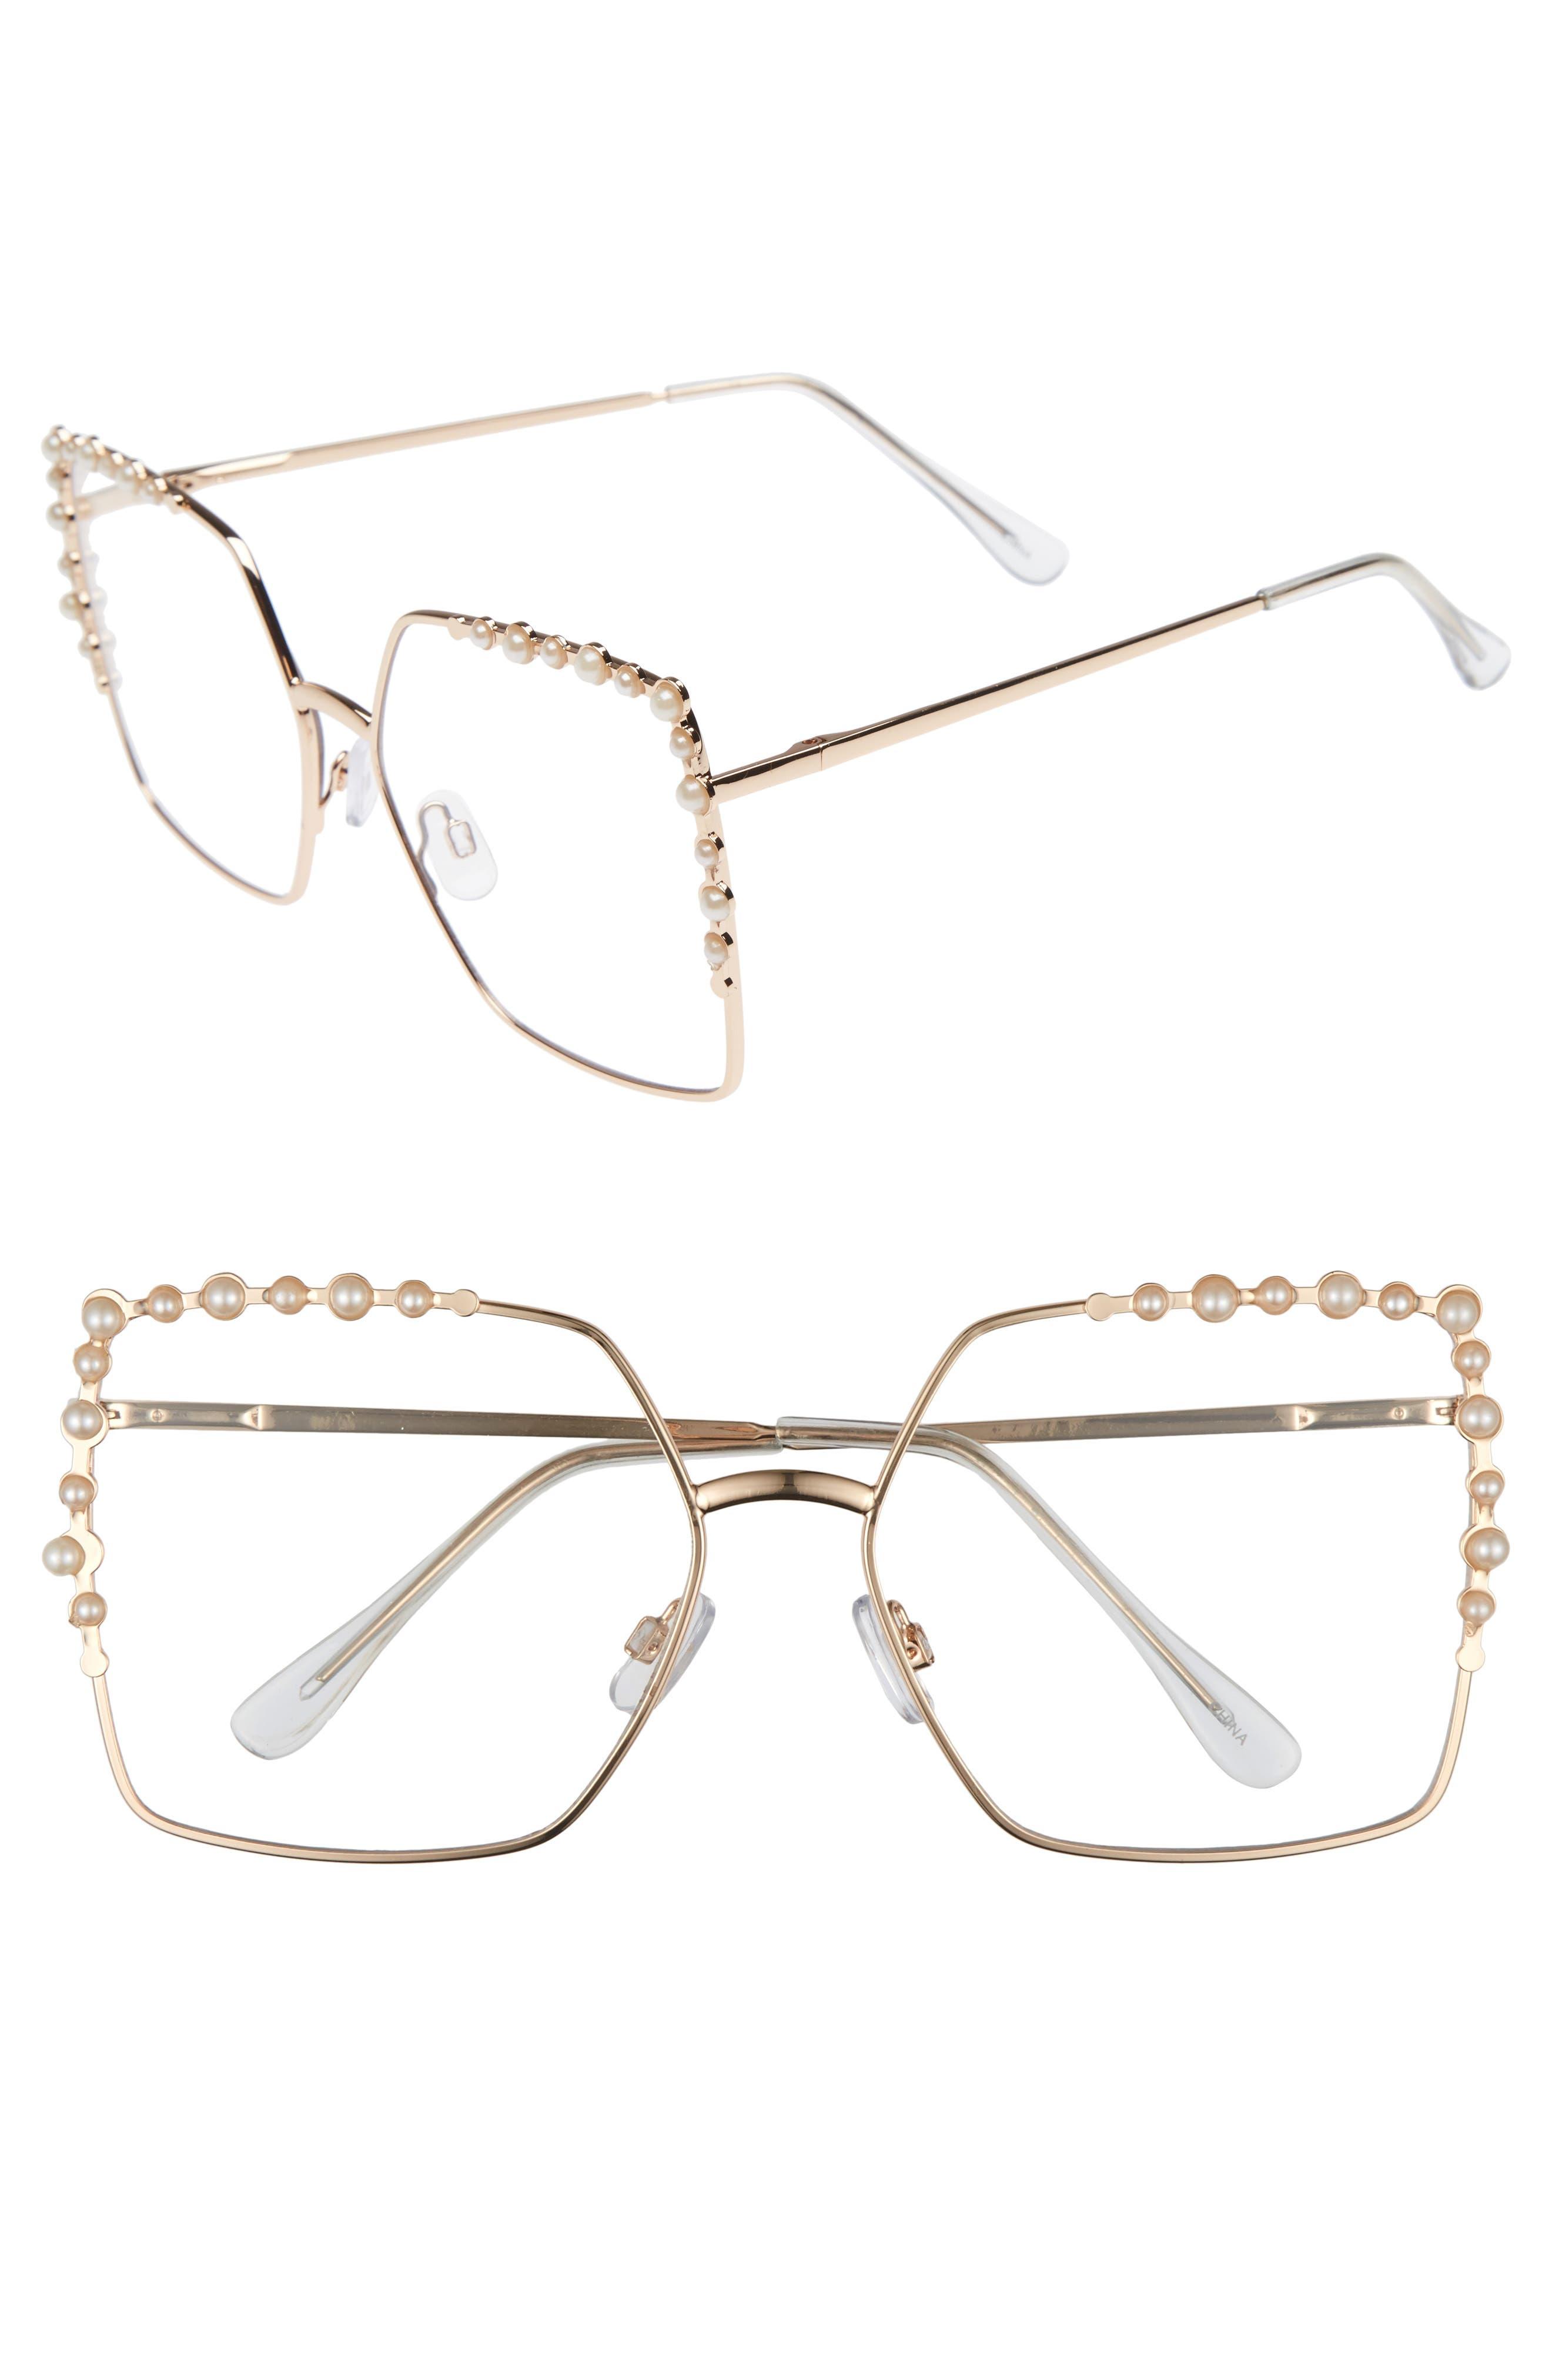 Alternate Image 1 Selected - Leith 63mm Imitation Pearl Square Fashion Glasses